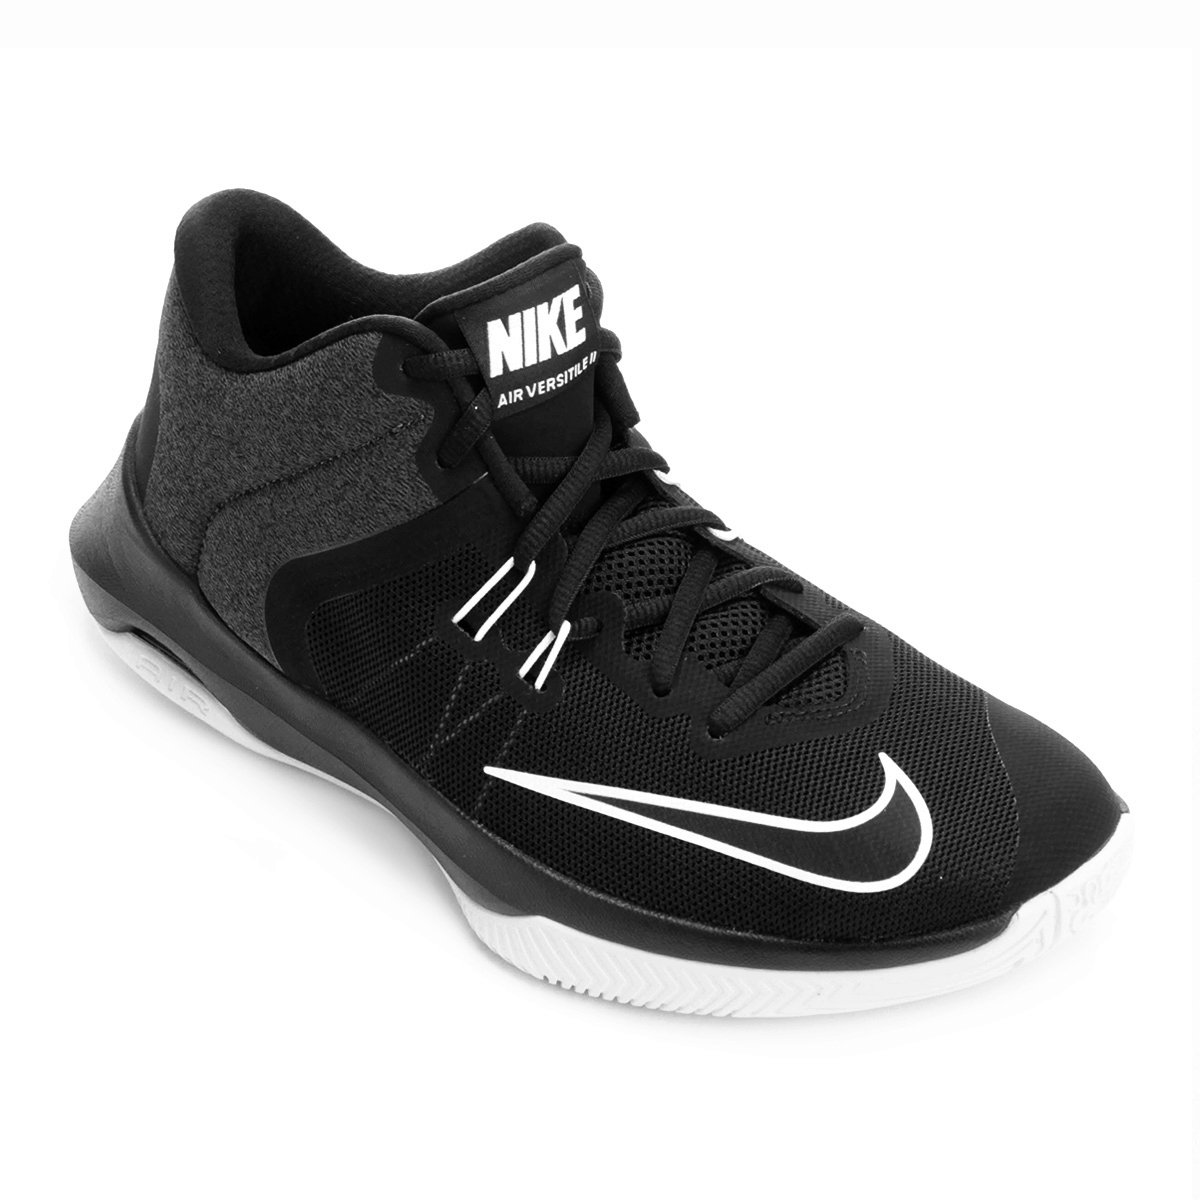 c79c6f37035 Tênis Masculino Nike Air Versitile 2 921692-001 - Preto Branco ...